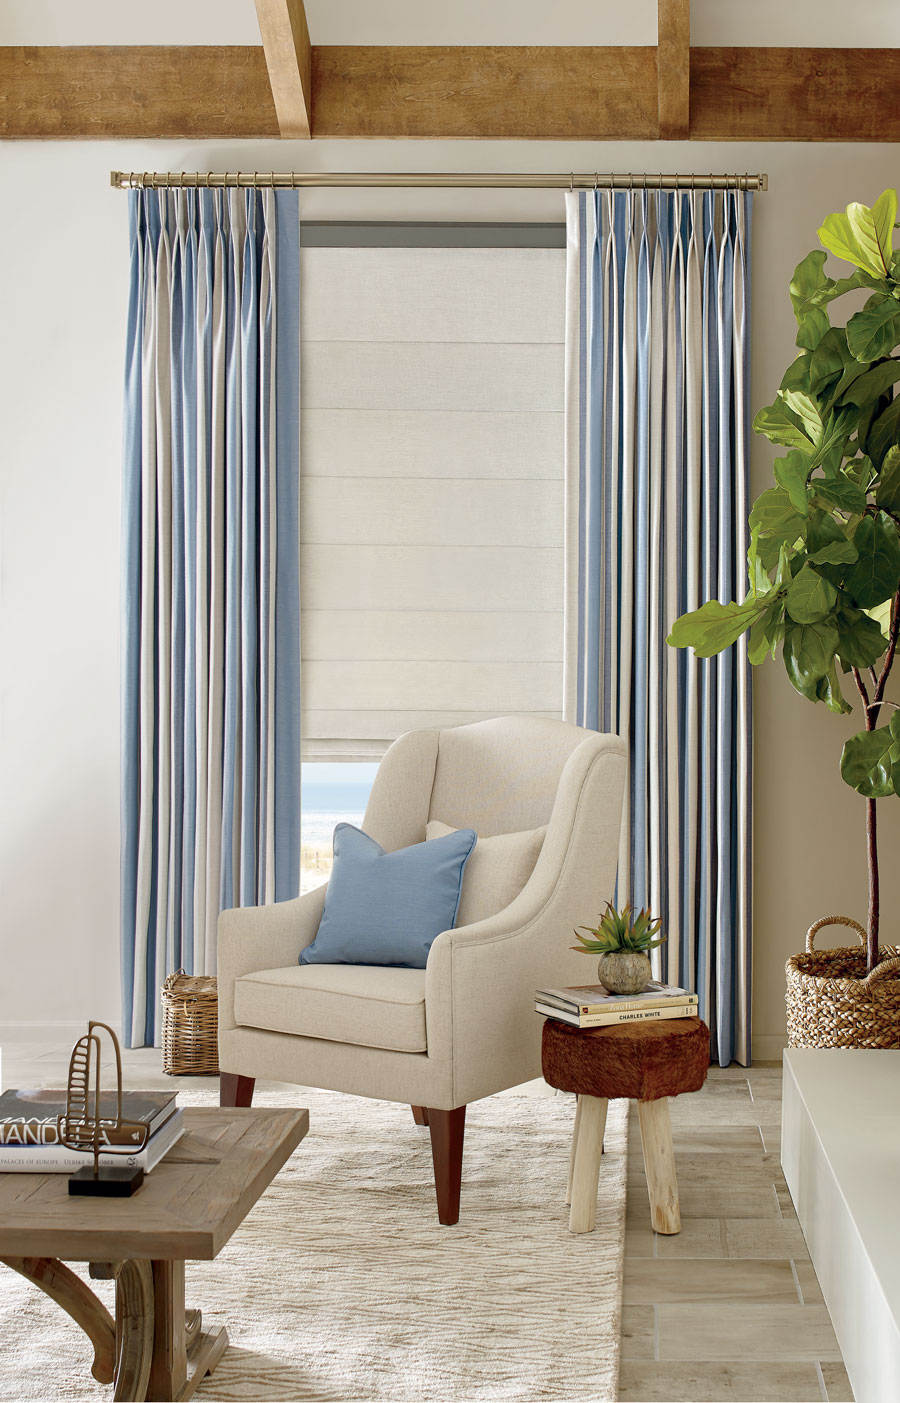 Blue striped draperies on large window